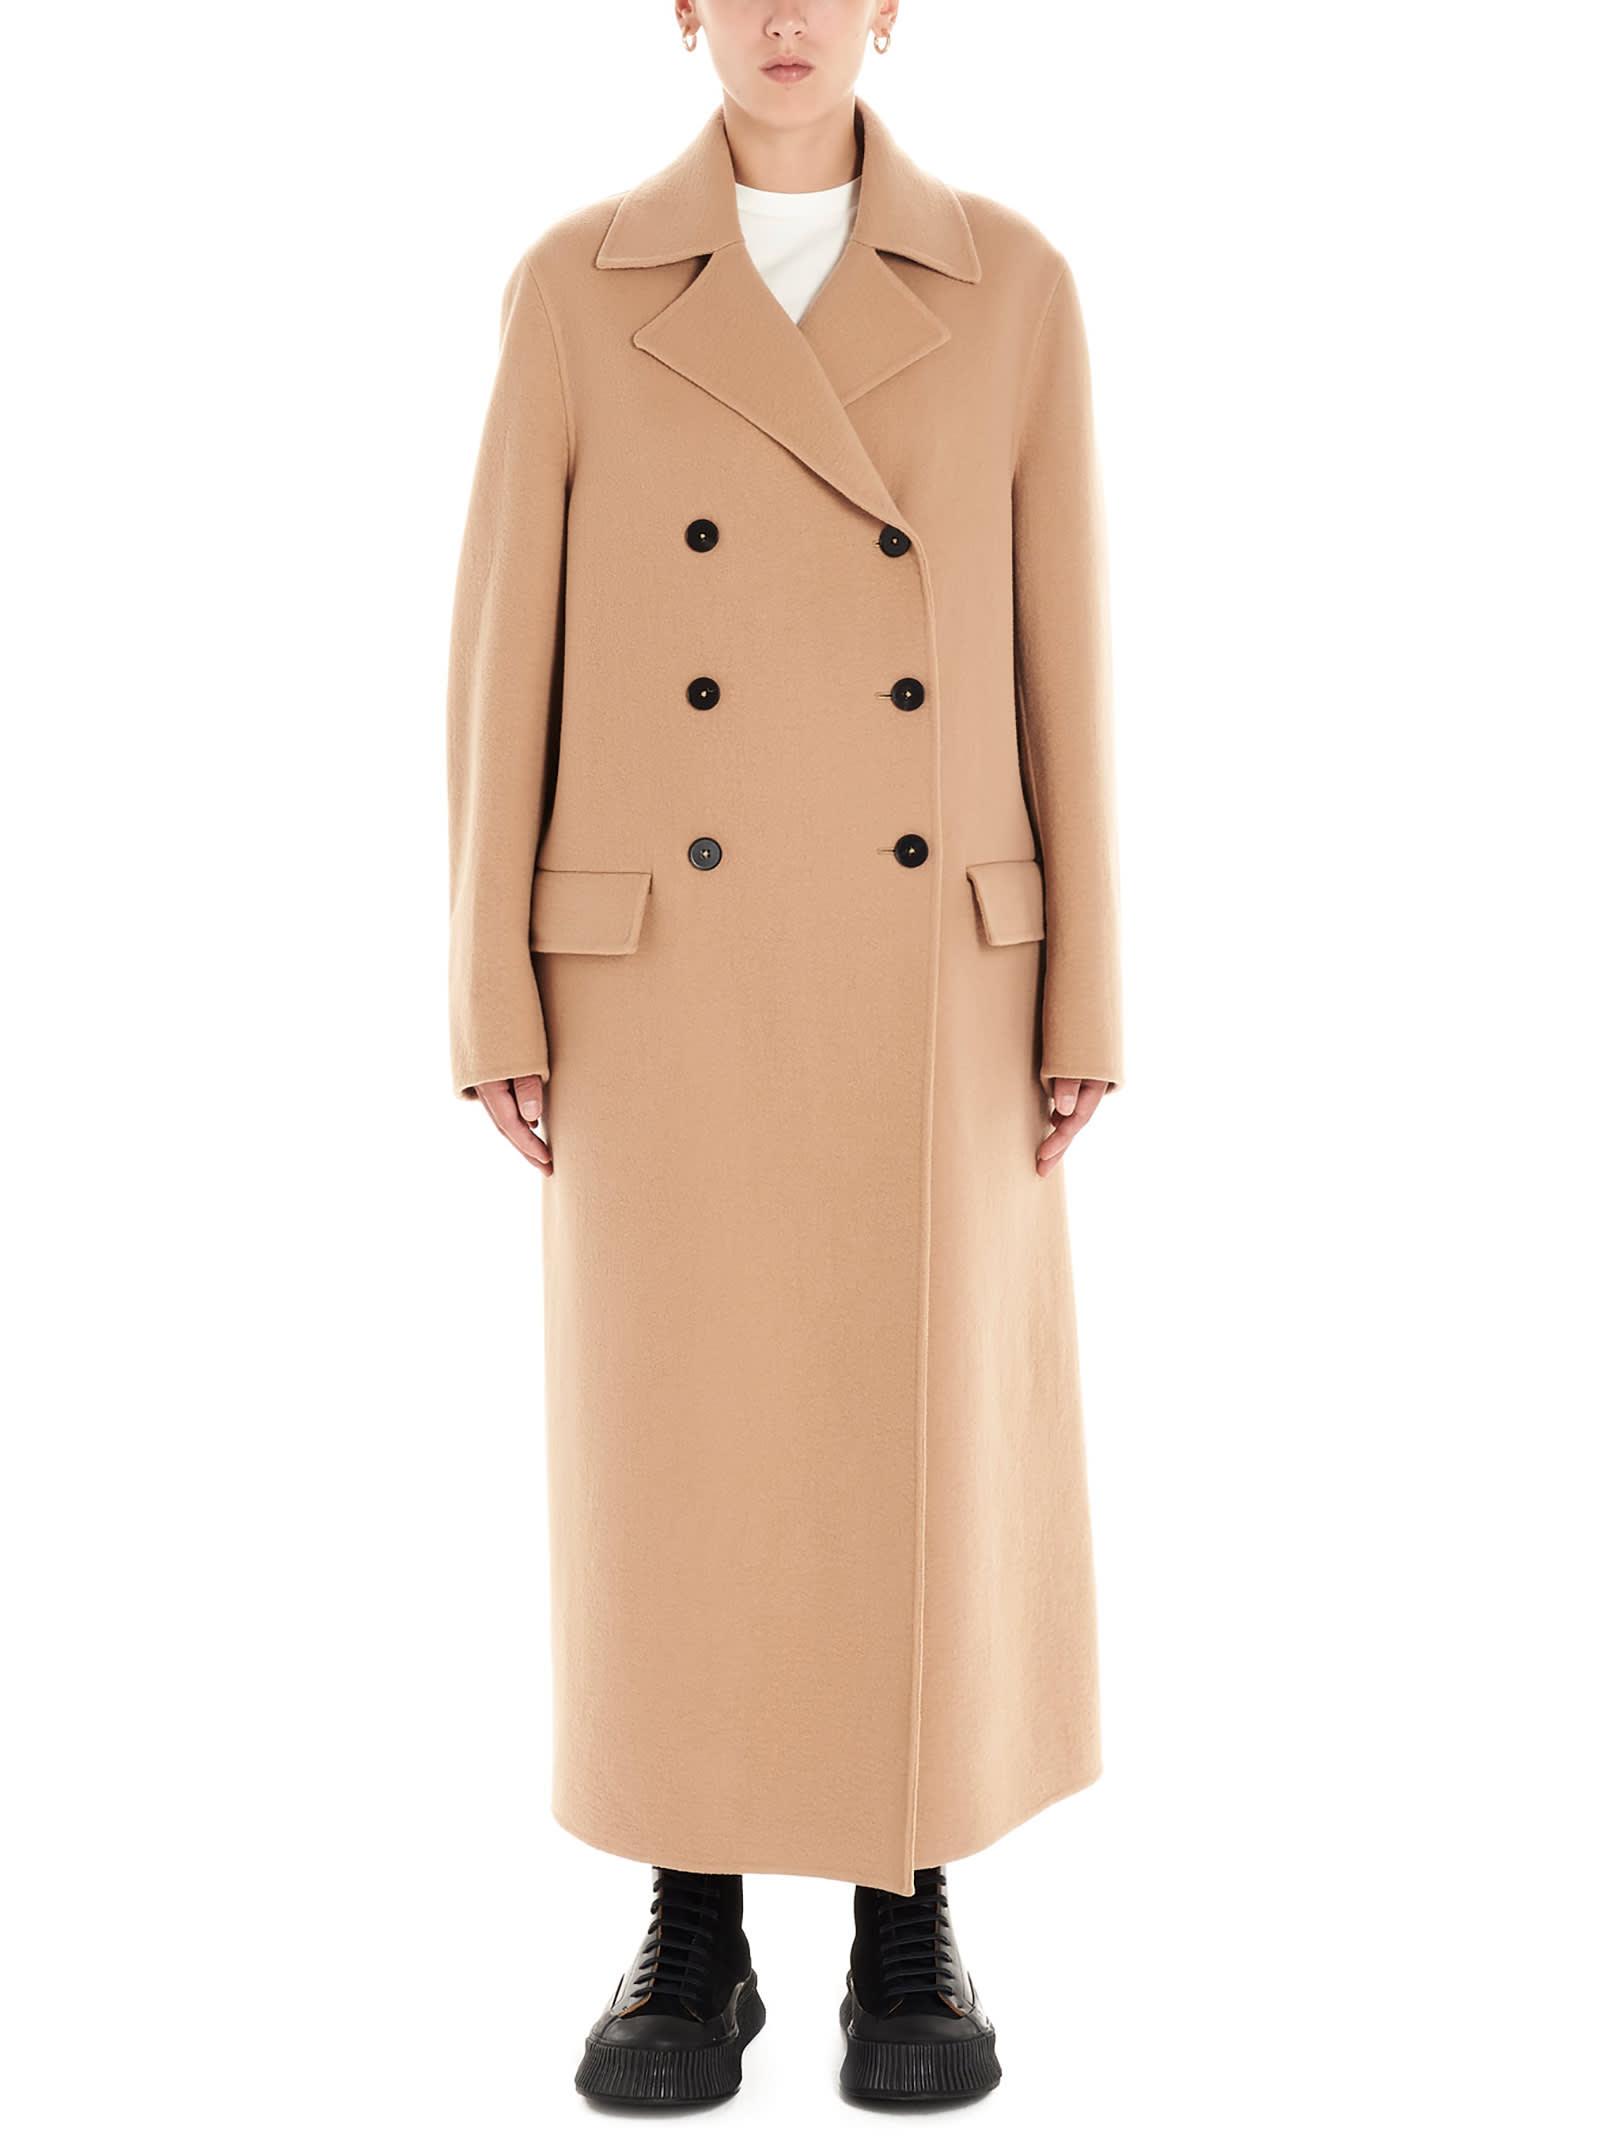 hot sale online b16ff 89d38 Jil Sander 'lucien' Coat